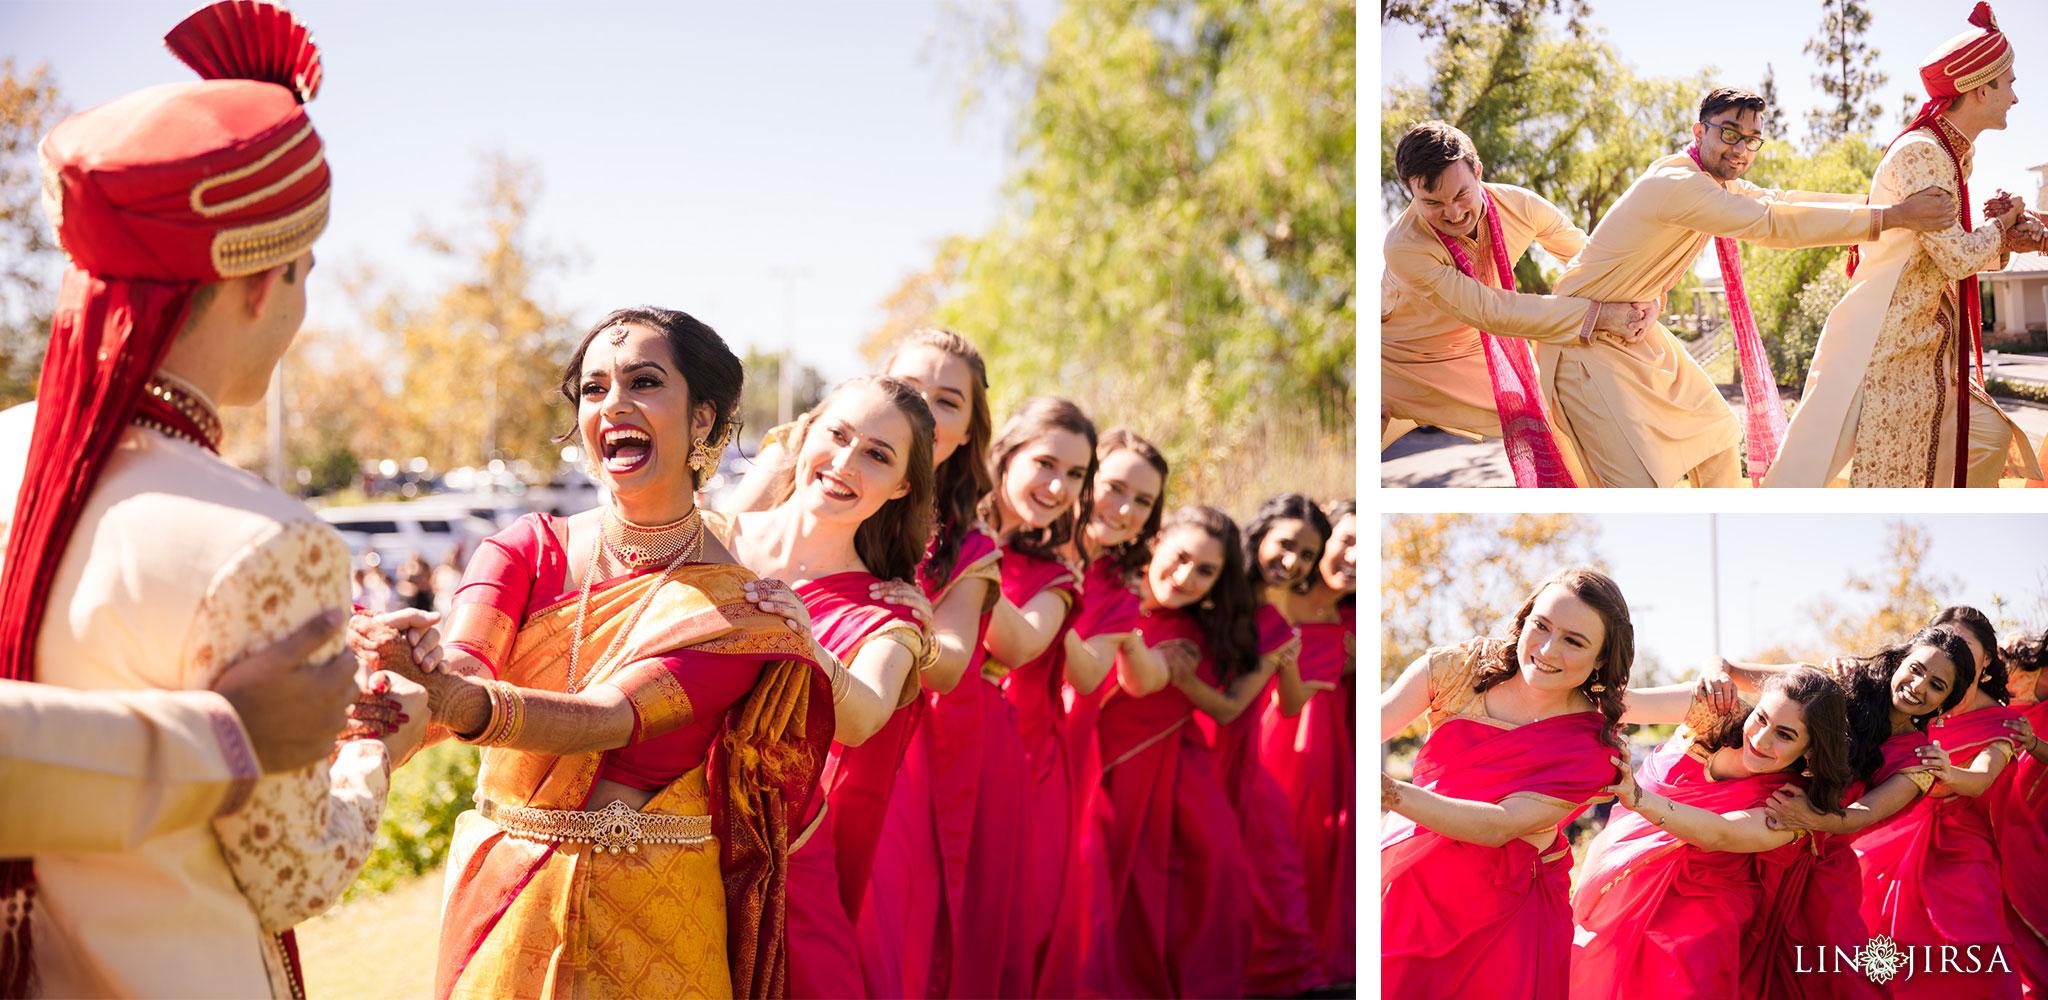 11 Black Gold Golf Course Yorba Linda Indian Wedding Photography